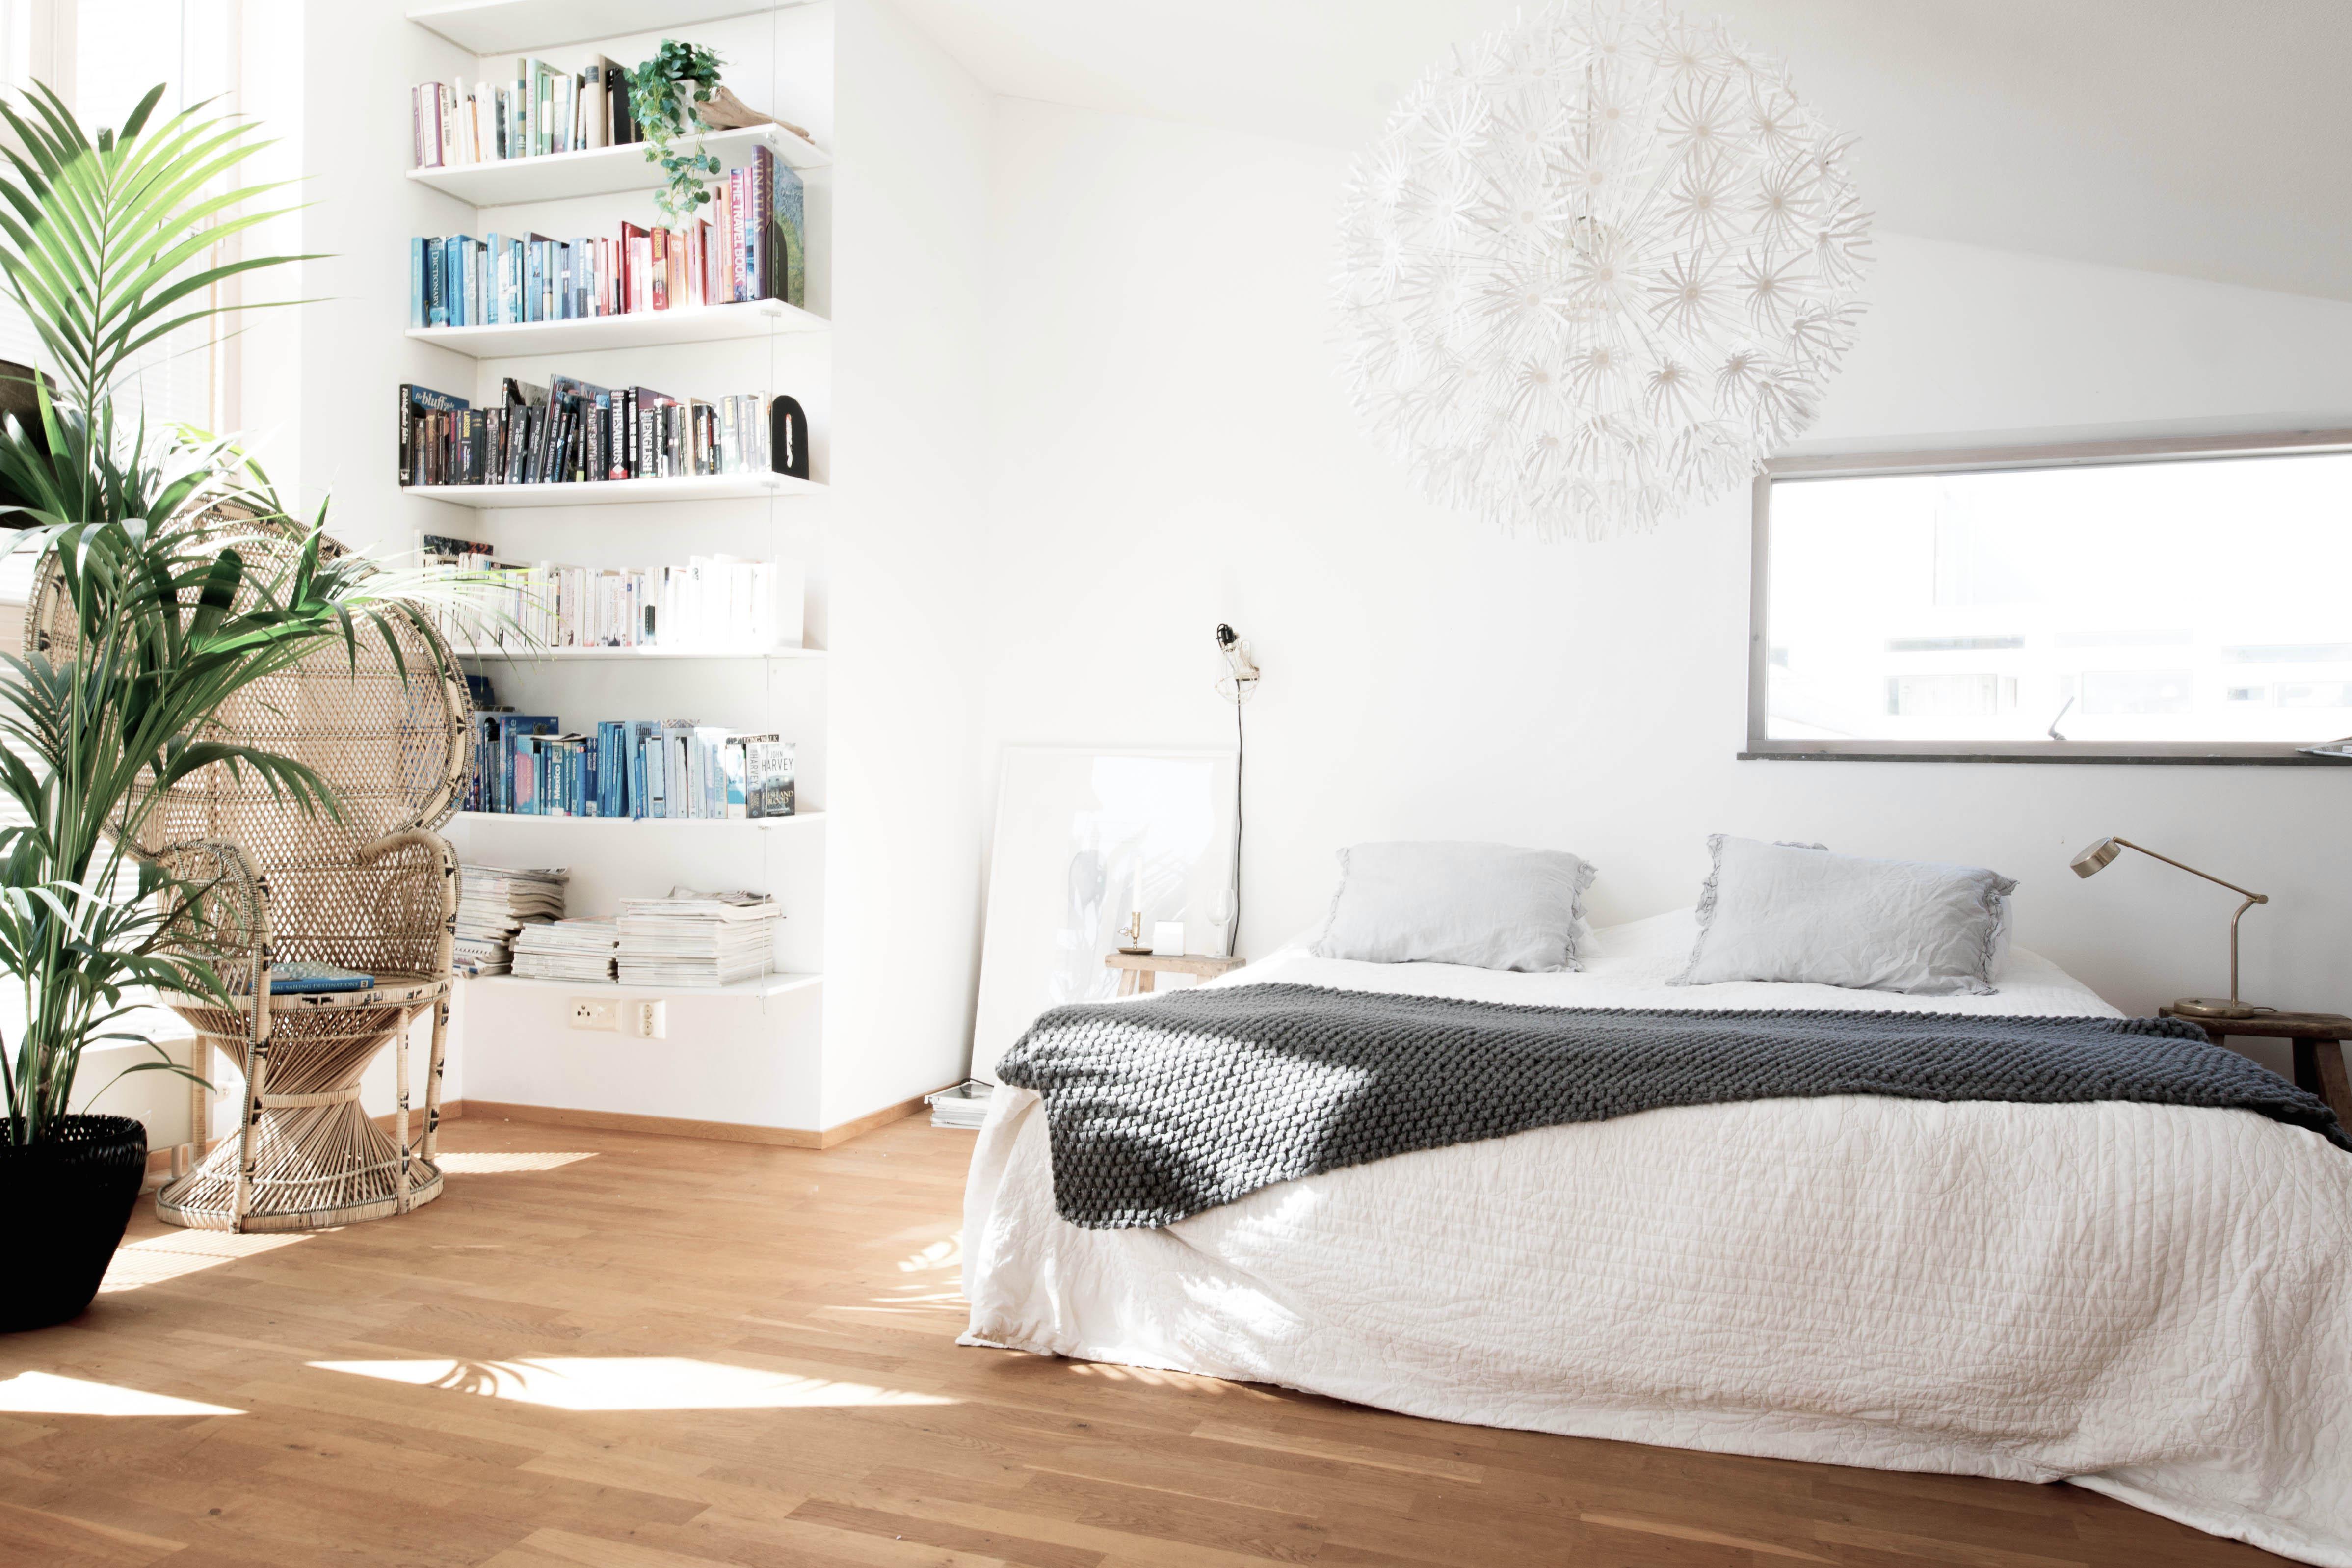 bloggers home niki brantmark my scandinavian home lilaliv. Black Bedroom Furniture Sets. Home Design Ideas